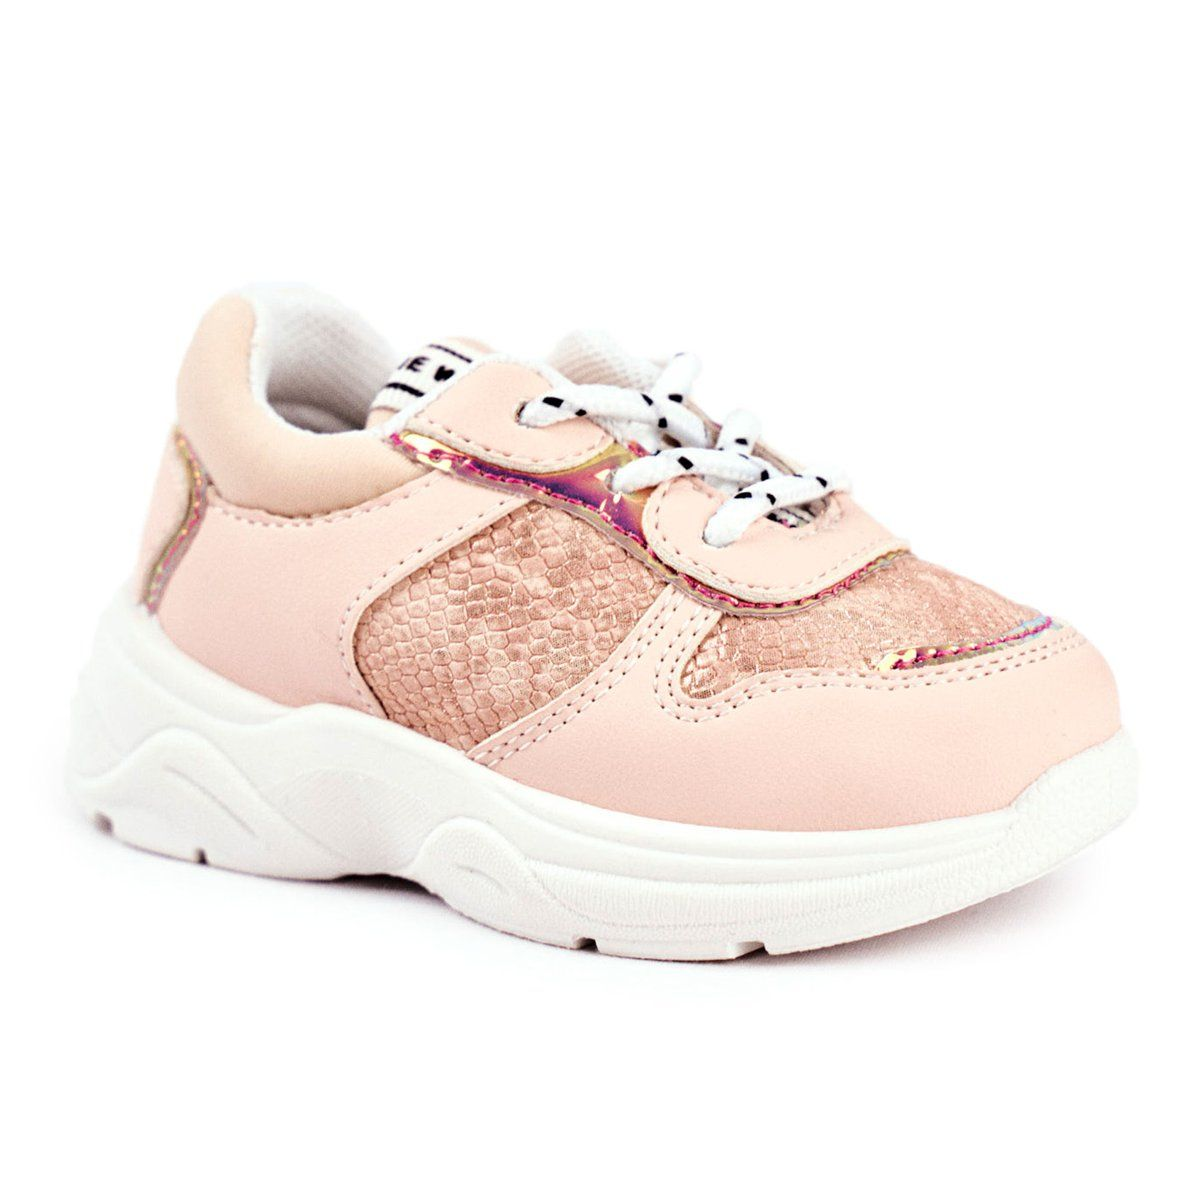 Frrock Obuwie Sportowe Dzieciece Wezowe Rozowe Matylda In 2020 Baby Shoes Shoes Sneakers